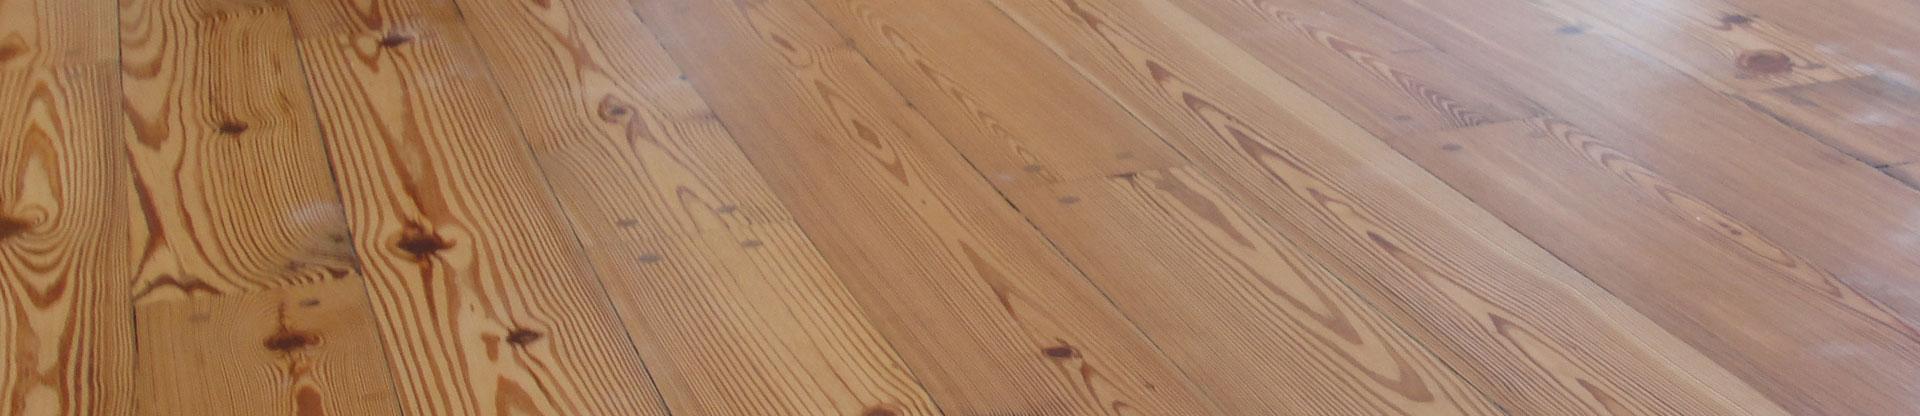 Plastificadora argentina pisos de madera de pinotea for Zocalos de madera para pisos